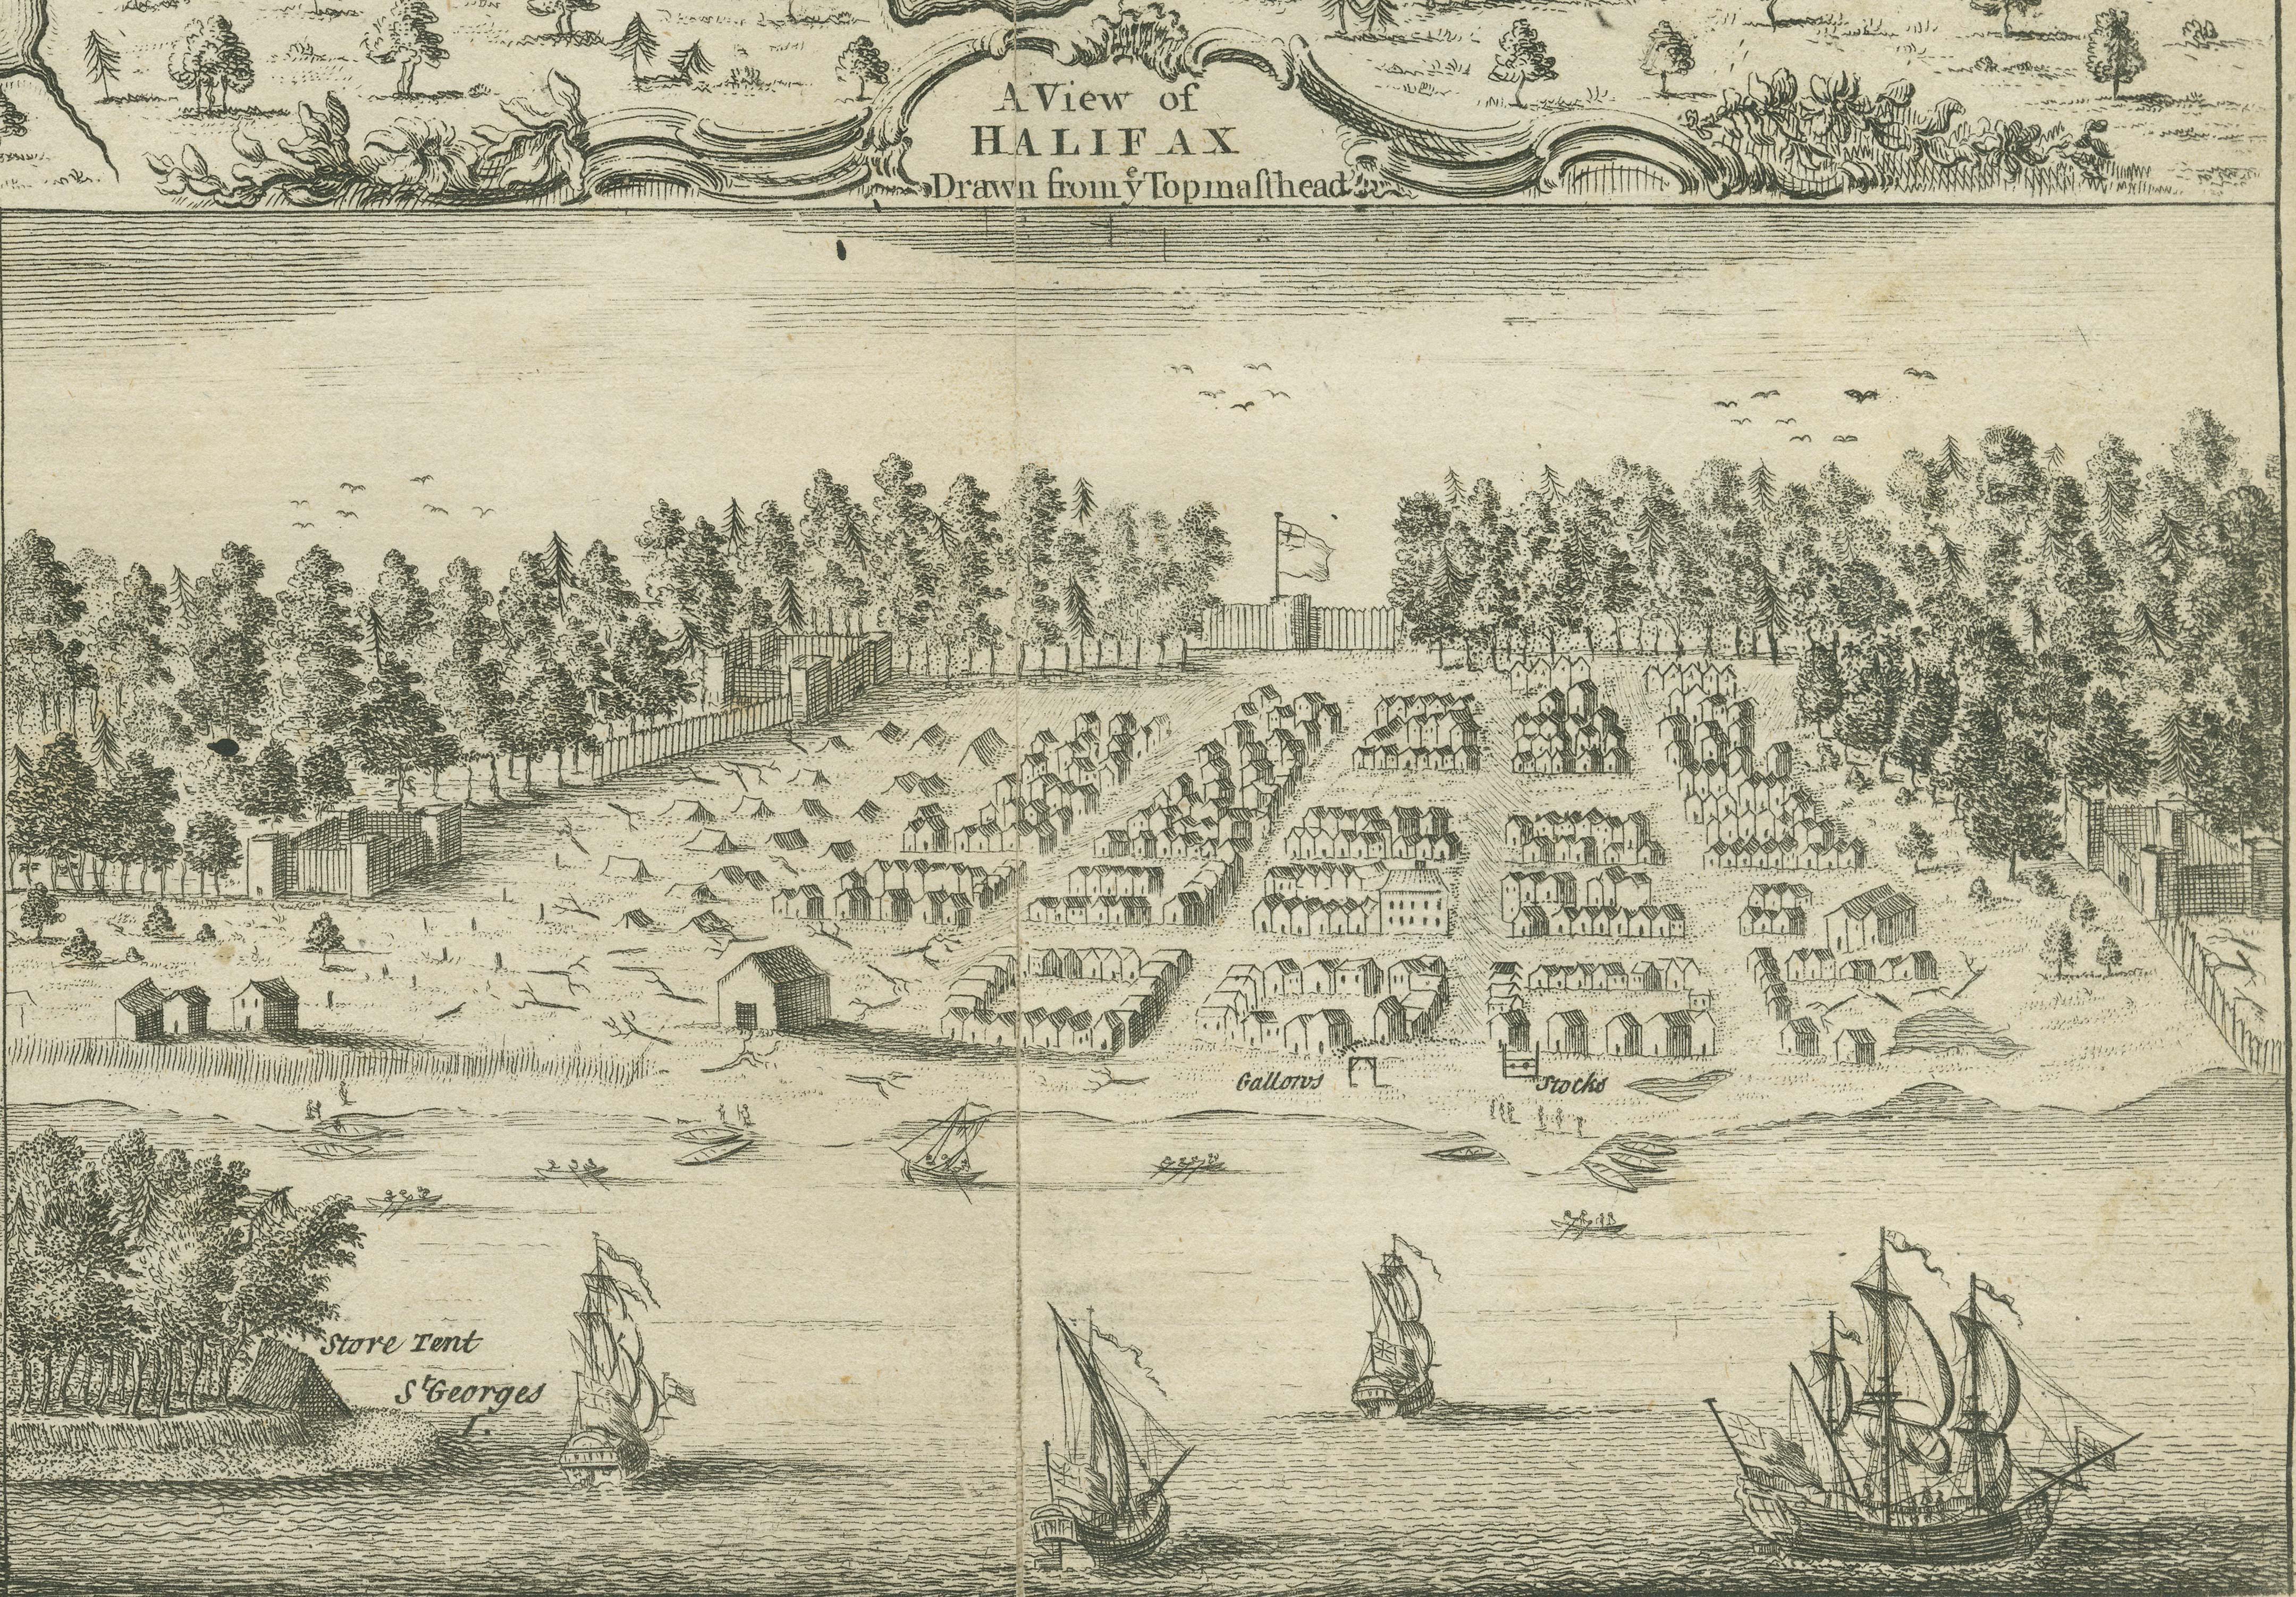 Sketch of Halifax, Nova Scotia, 1749.